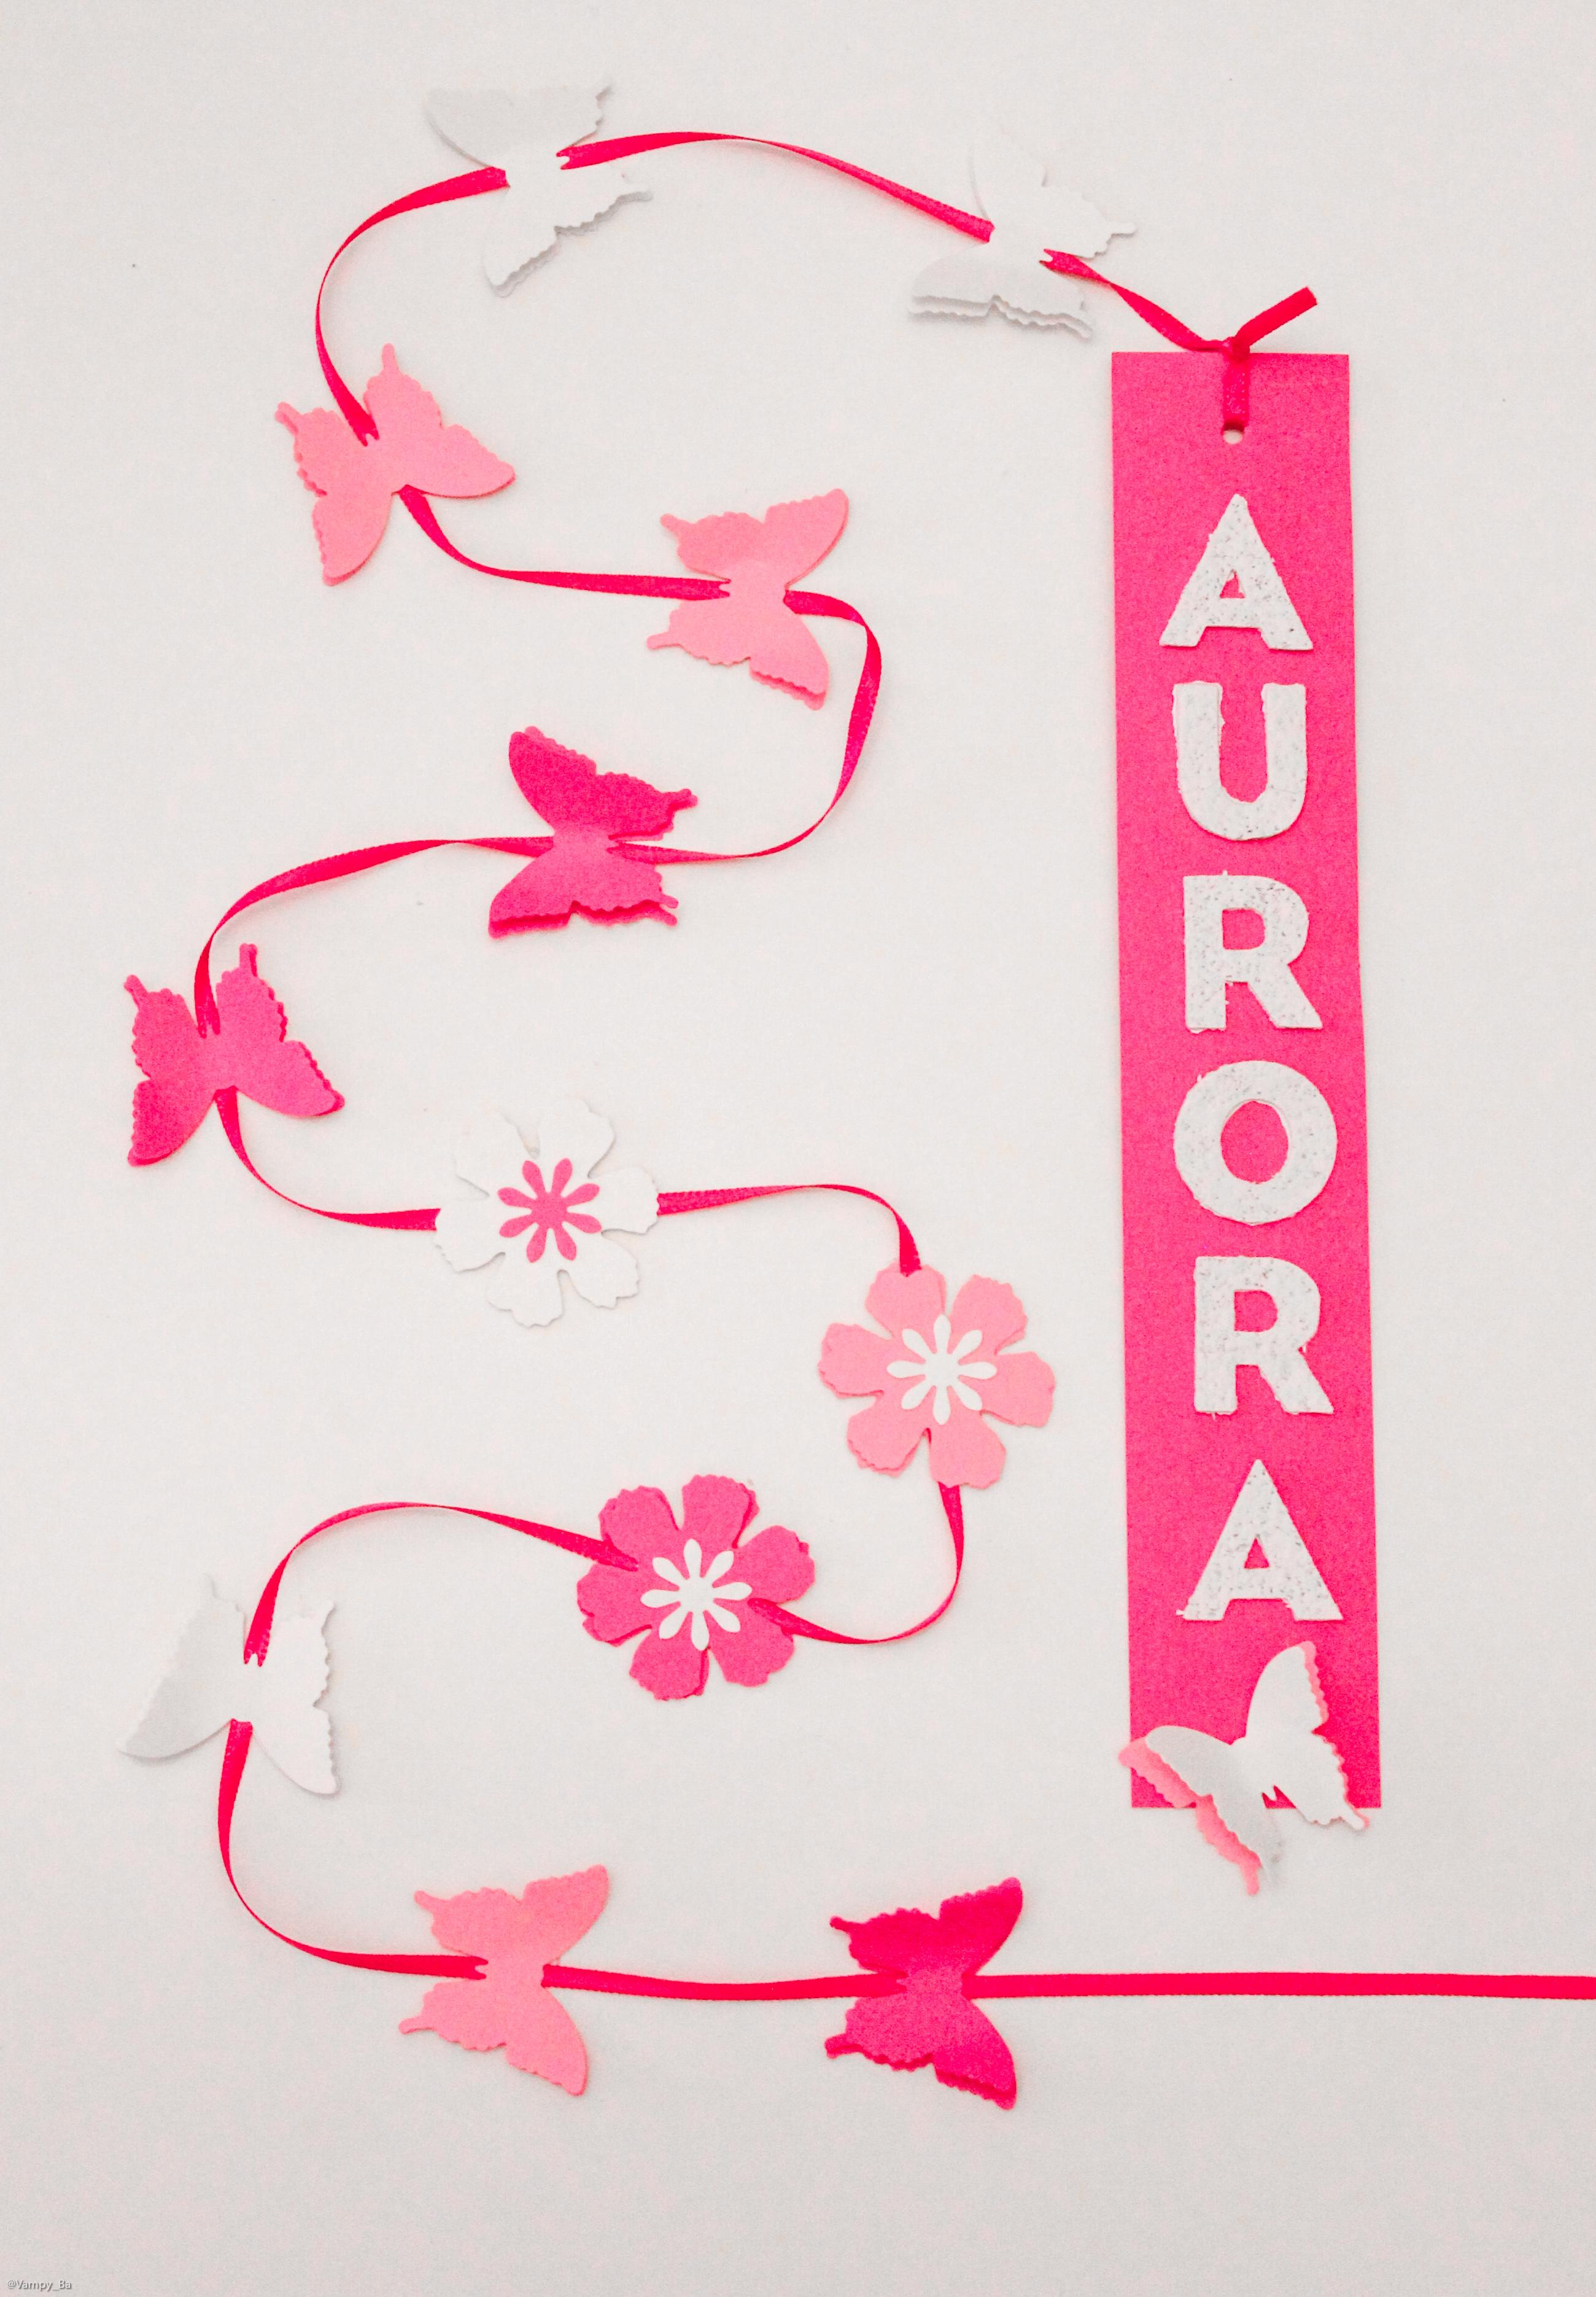 Aurora_mirabilecarta13.jpg